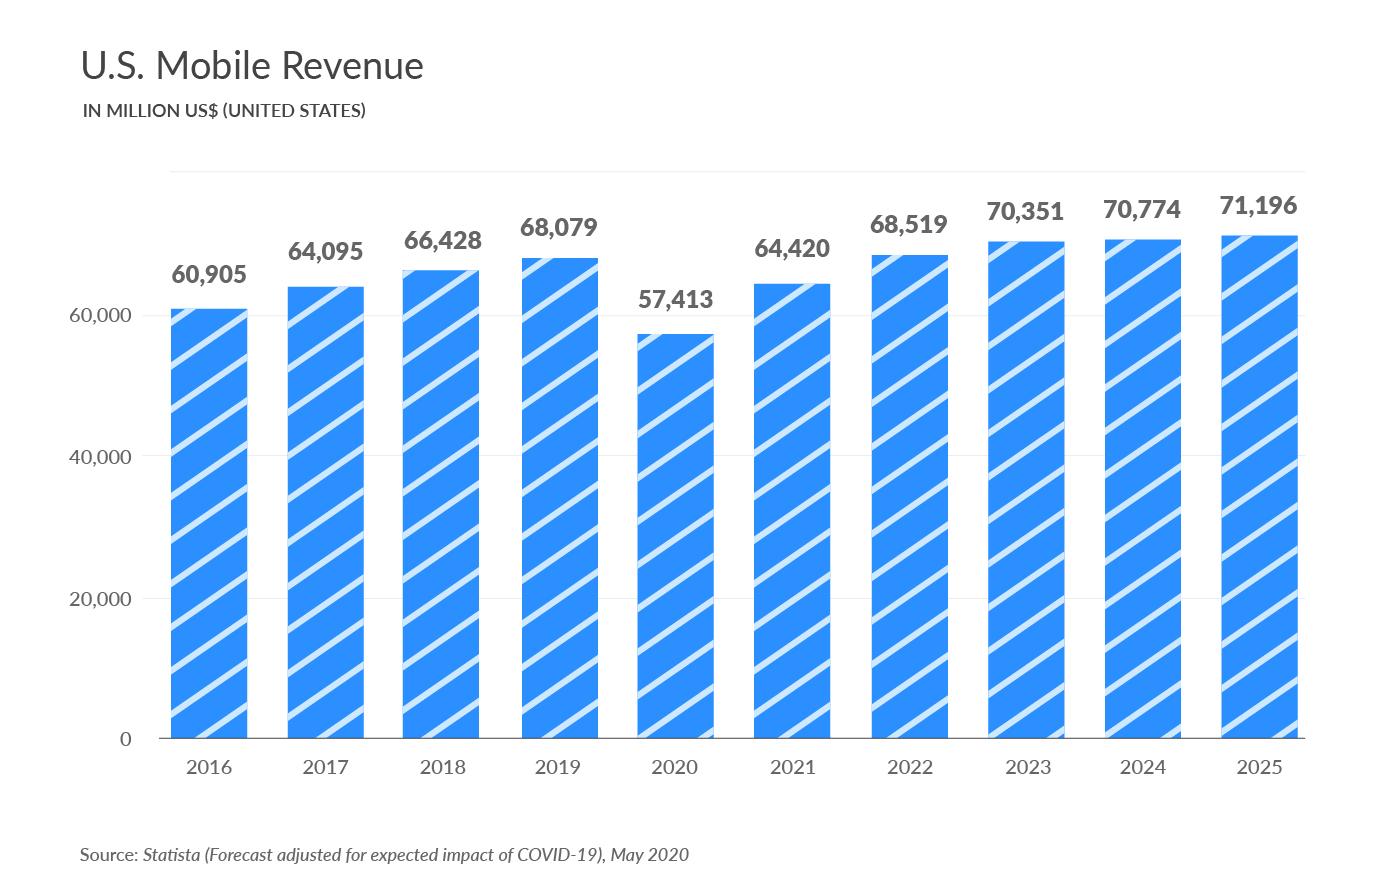 U.S. Mobile Revenue